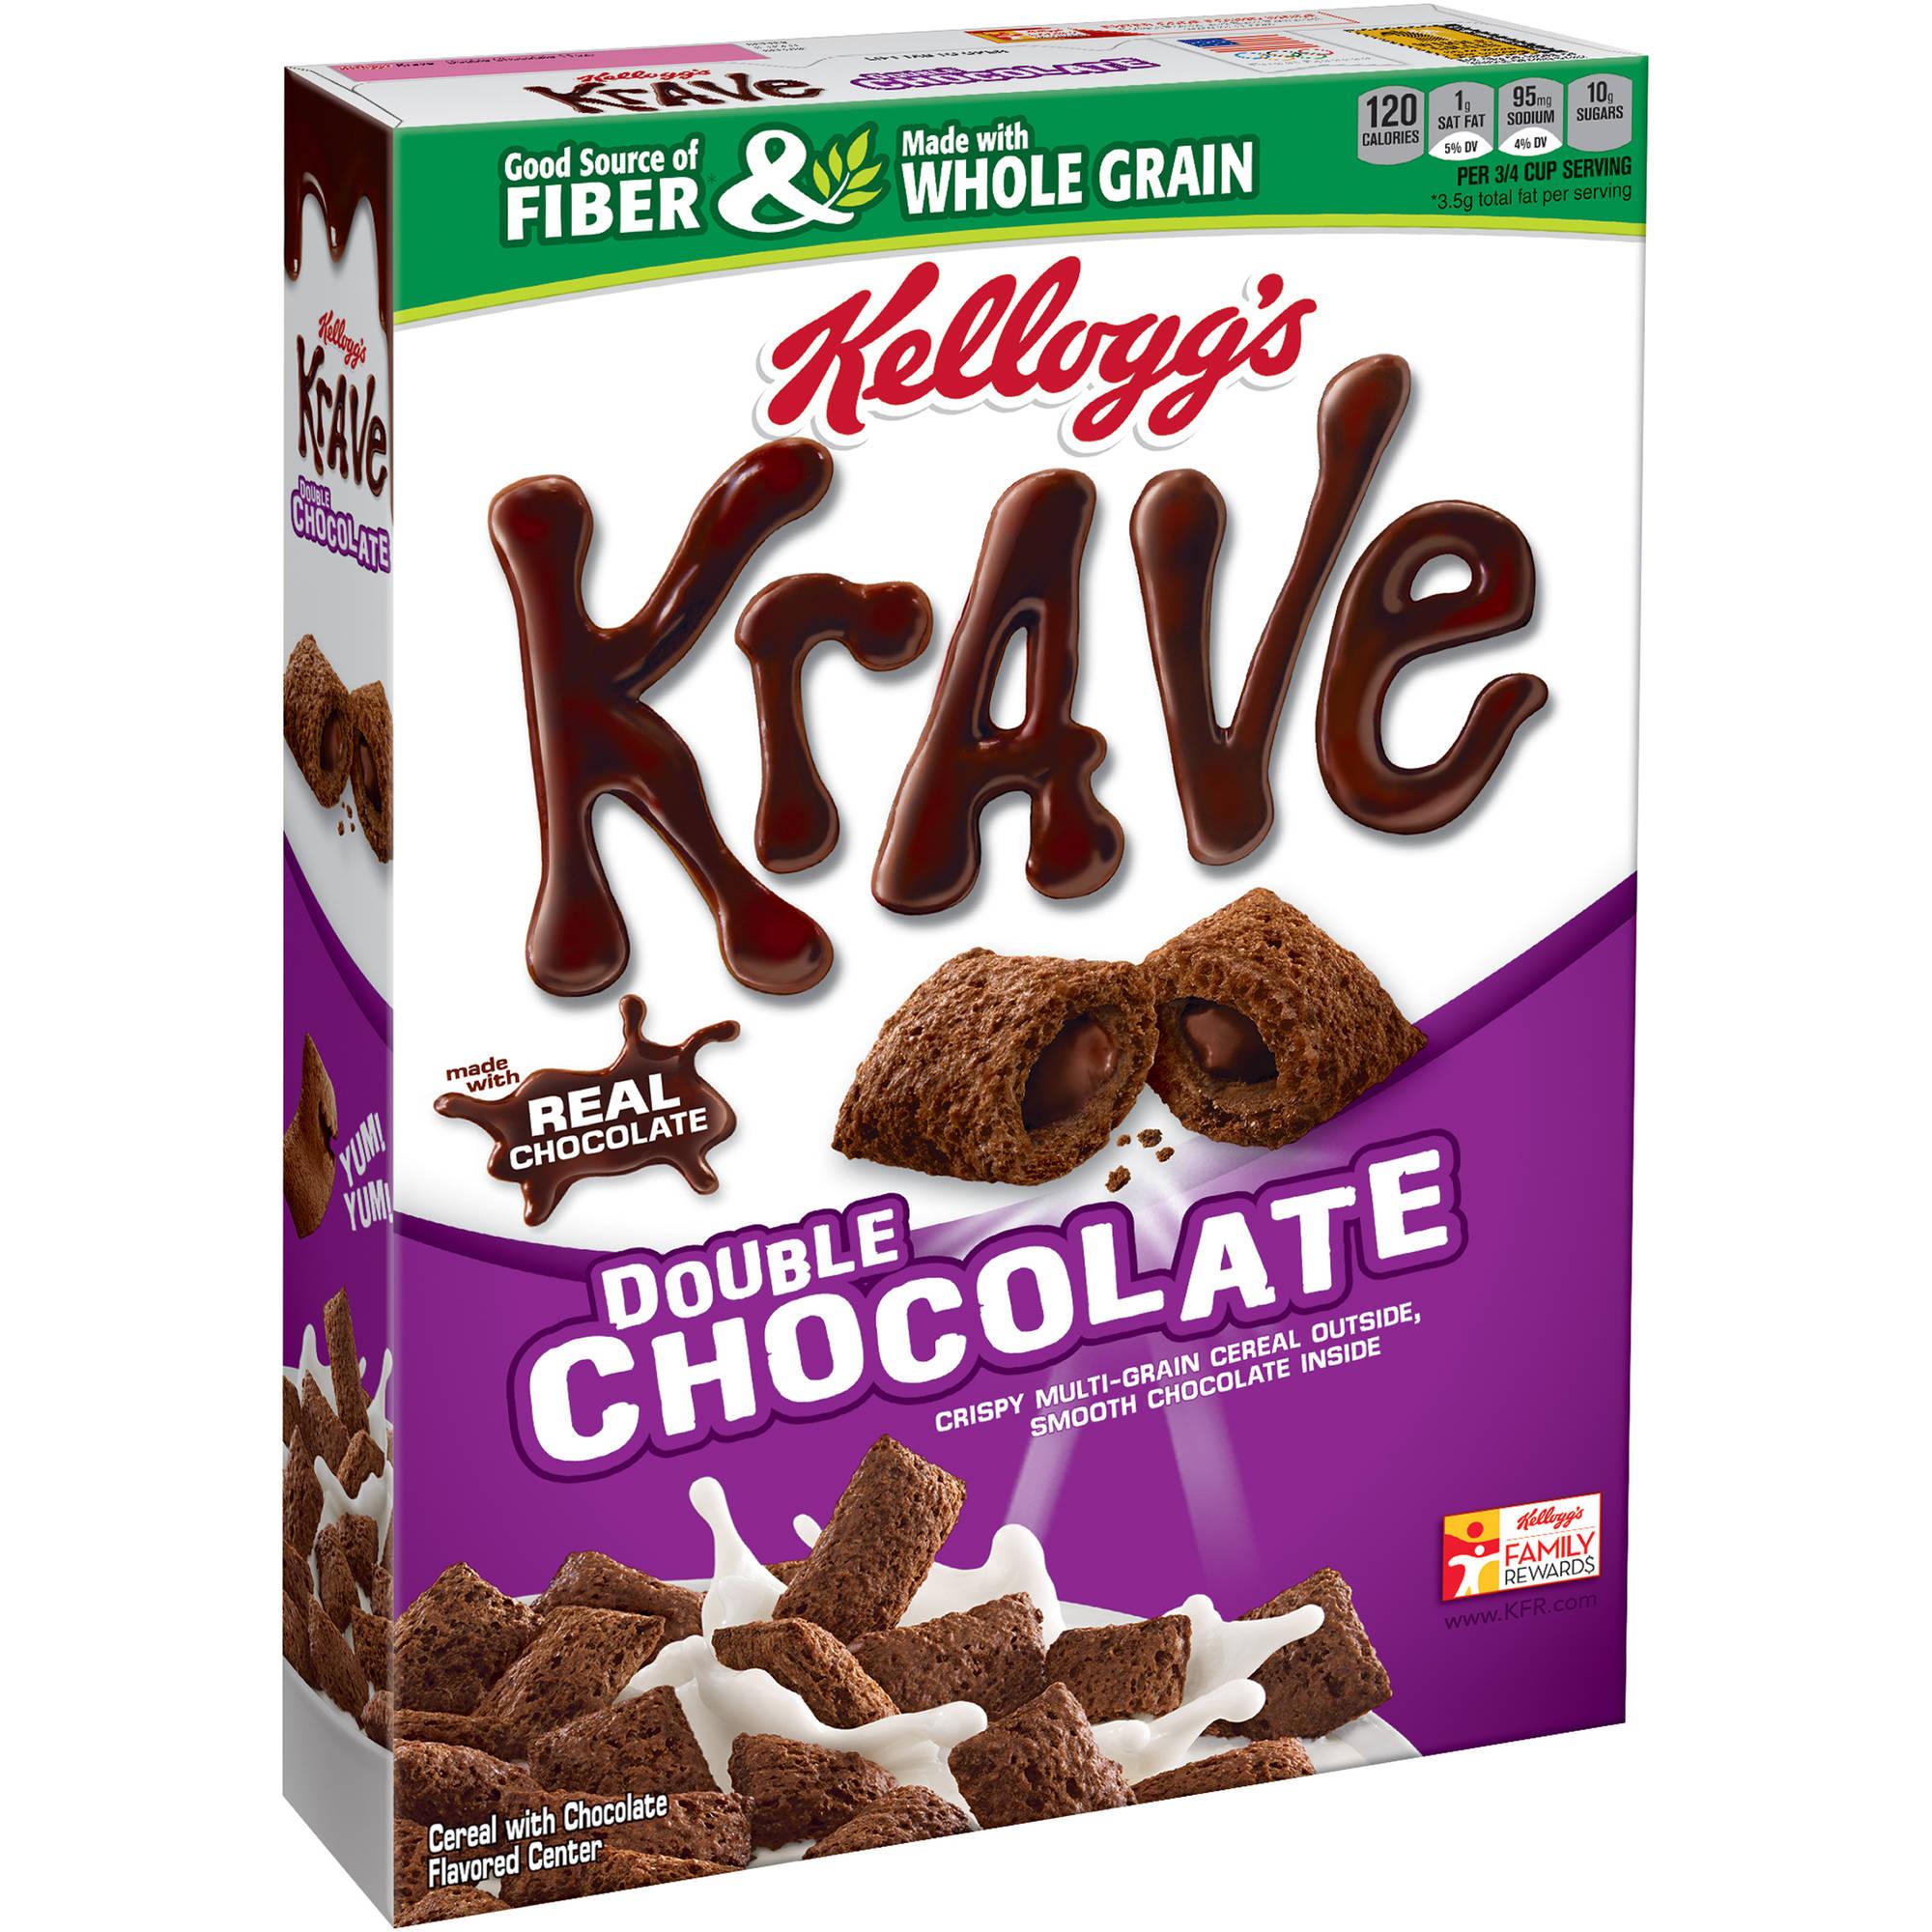 Kellogg's Krave Double Chocolate Cereal, 11 oz